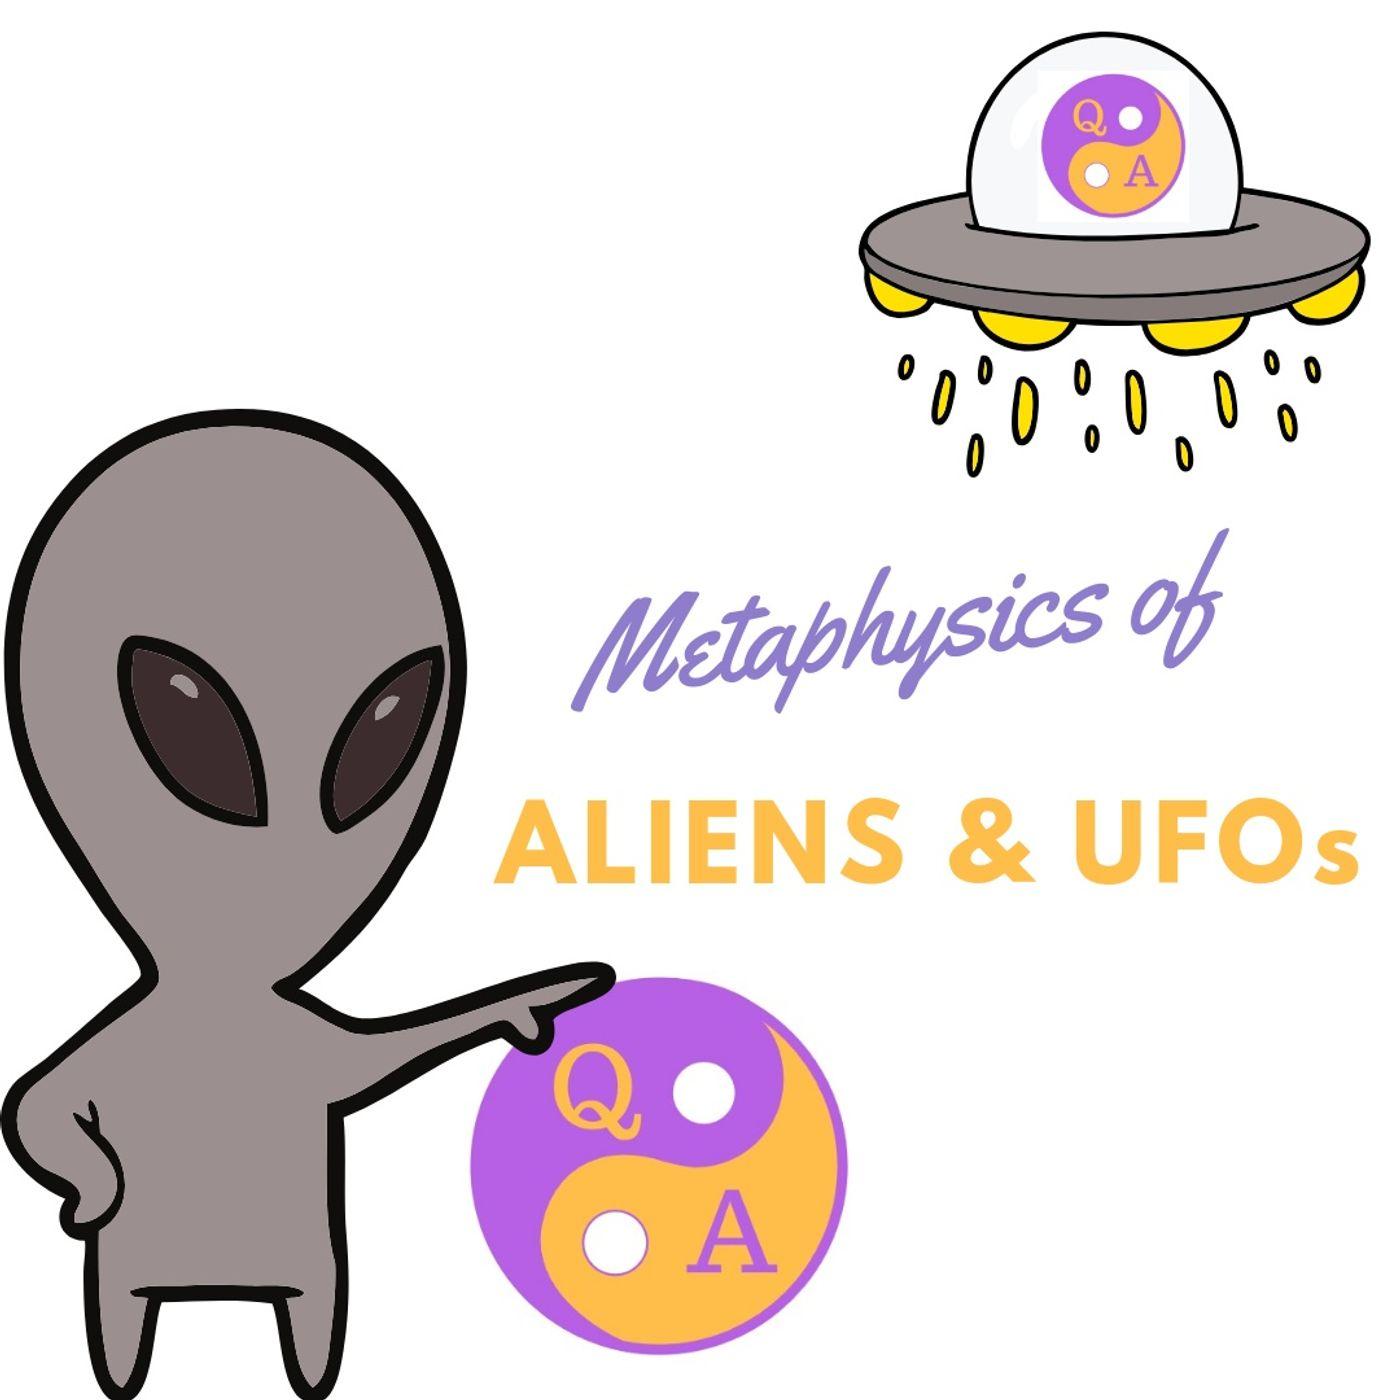 Metaphysics of Aliens & UFOs